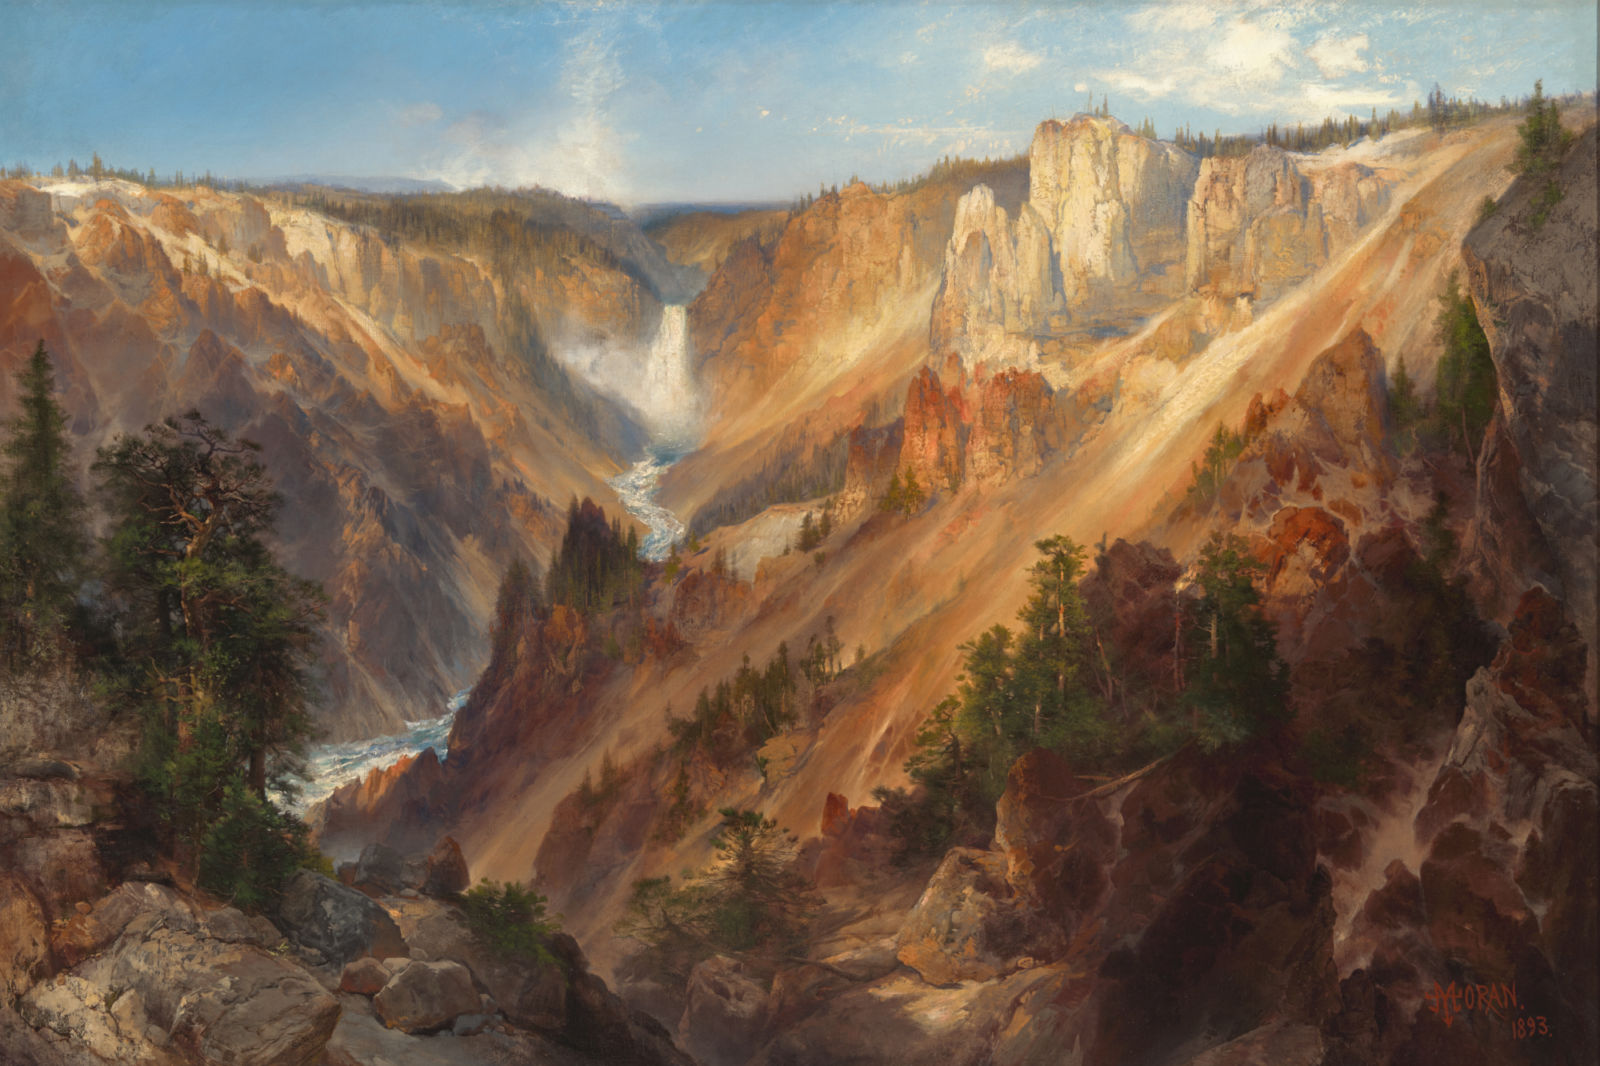 Painting of the Grand Canyon by Thomas Moran